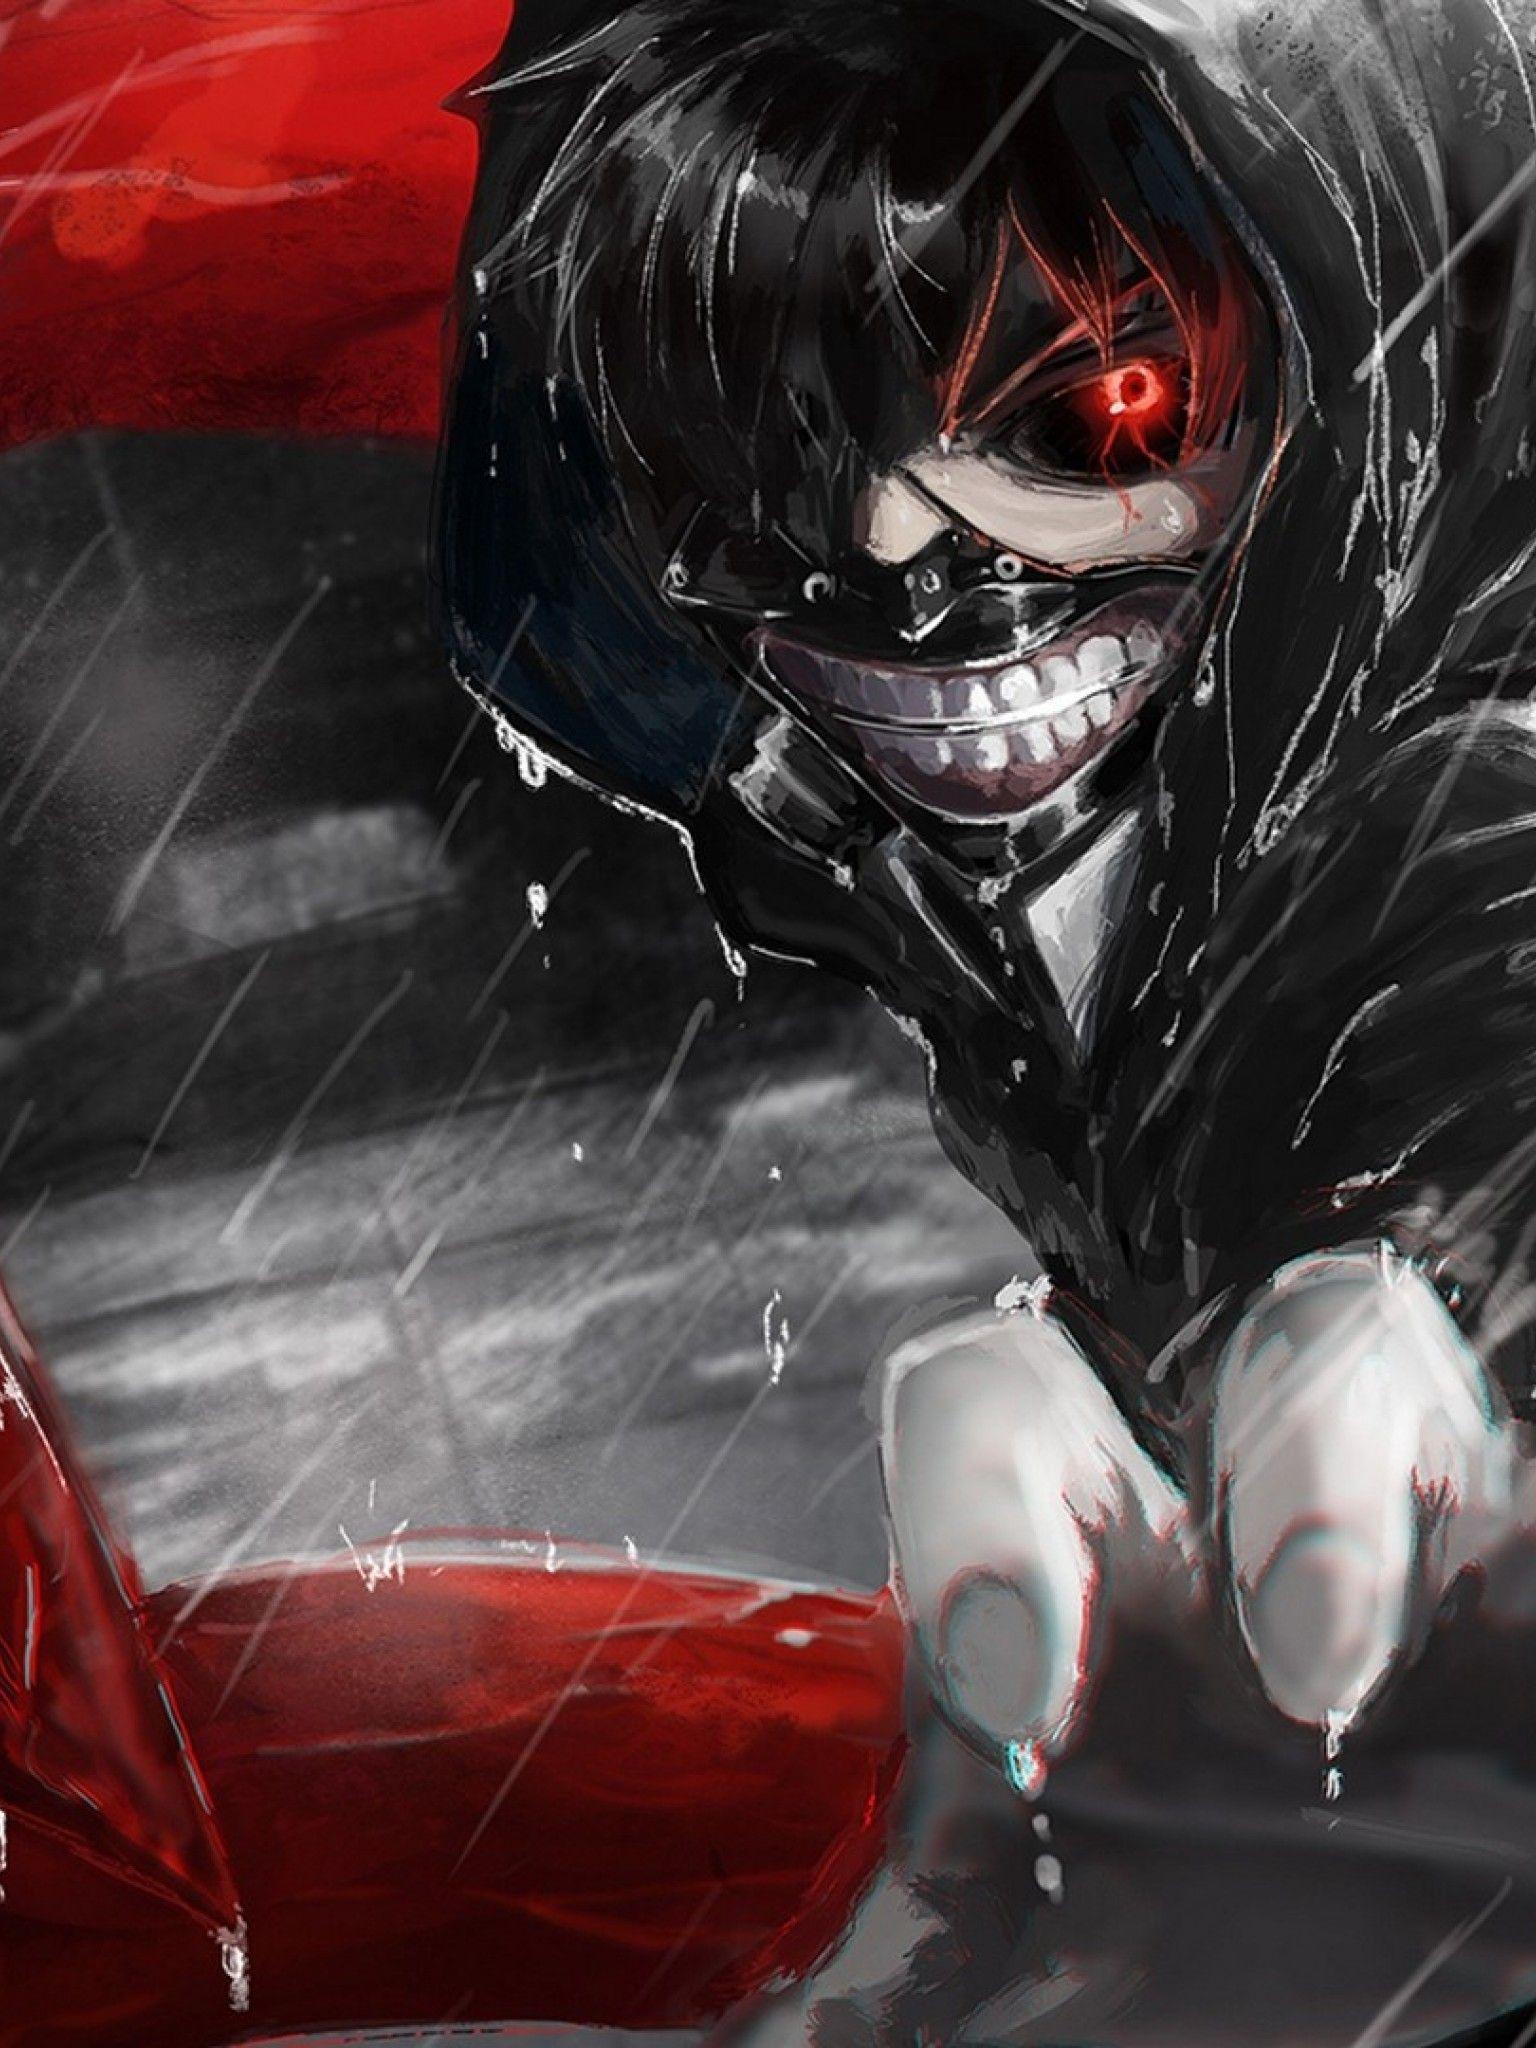 4K Tokyo Ghoul iPhone Wallpapers - Top Free 4K Tokyo Ghoul iPhone Backgrounds - WallpaperAccess